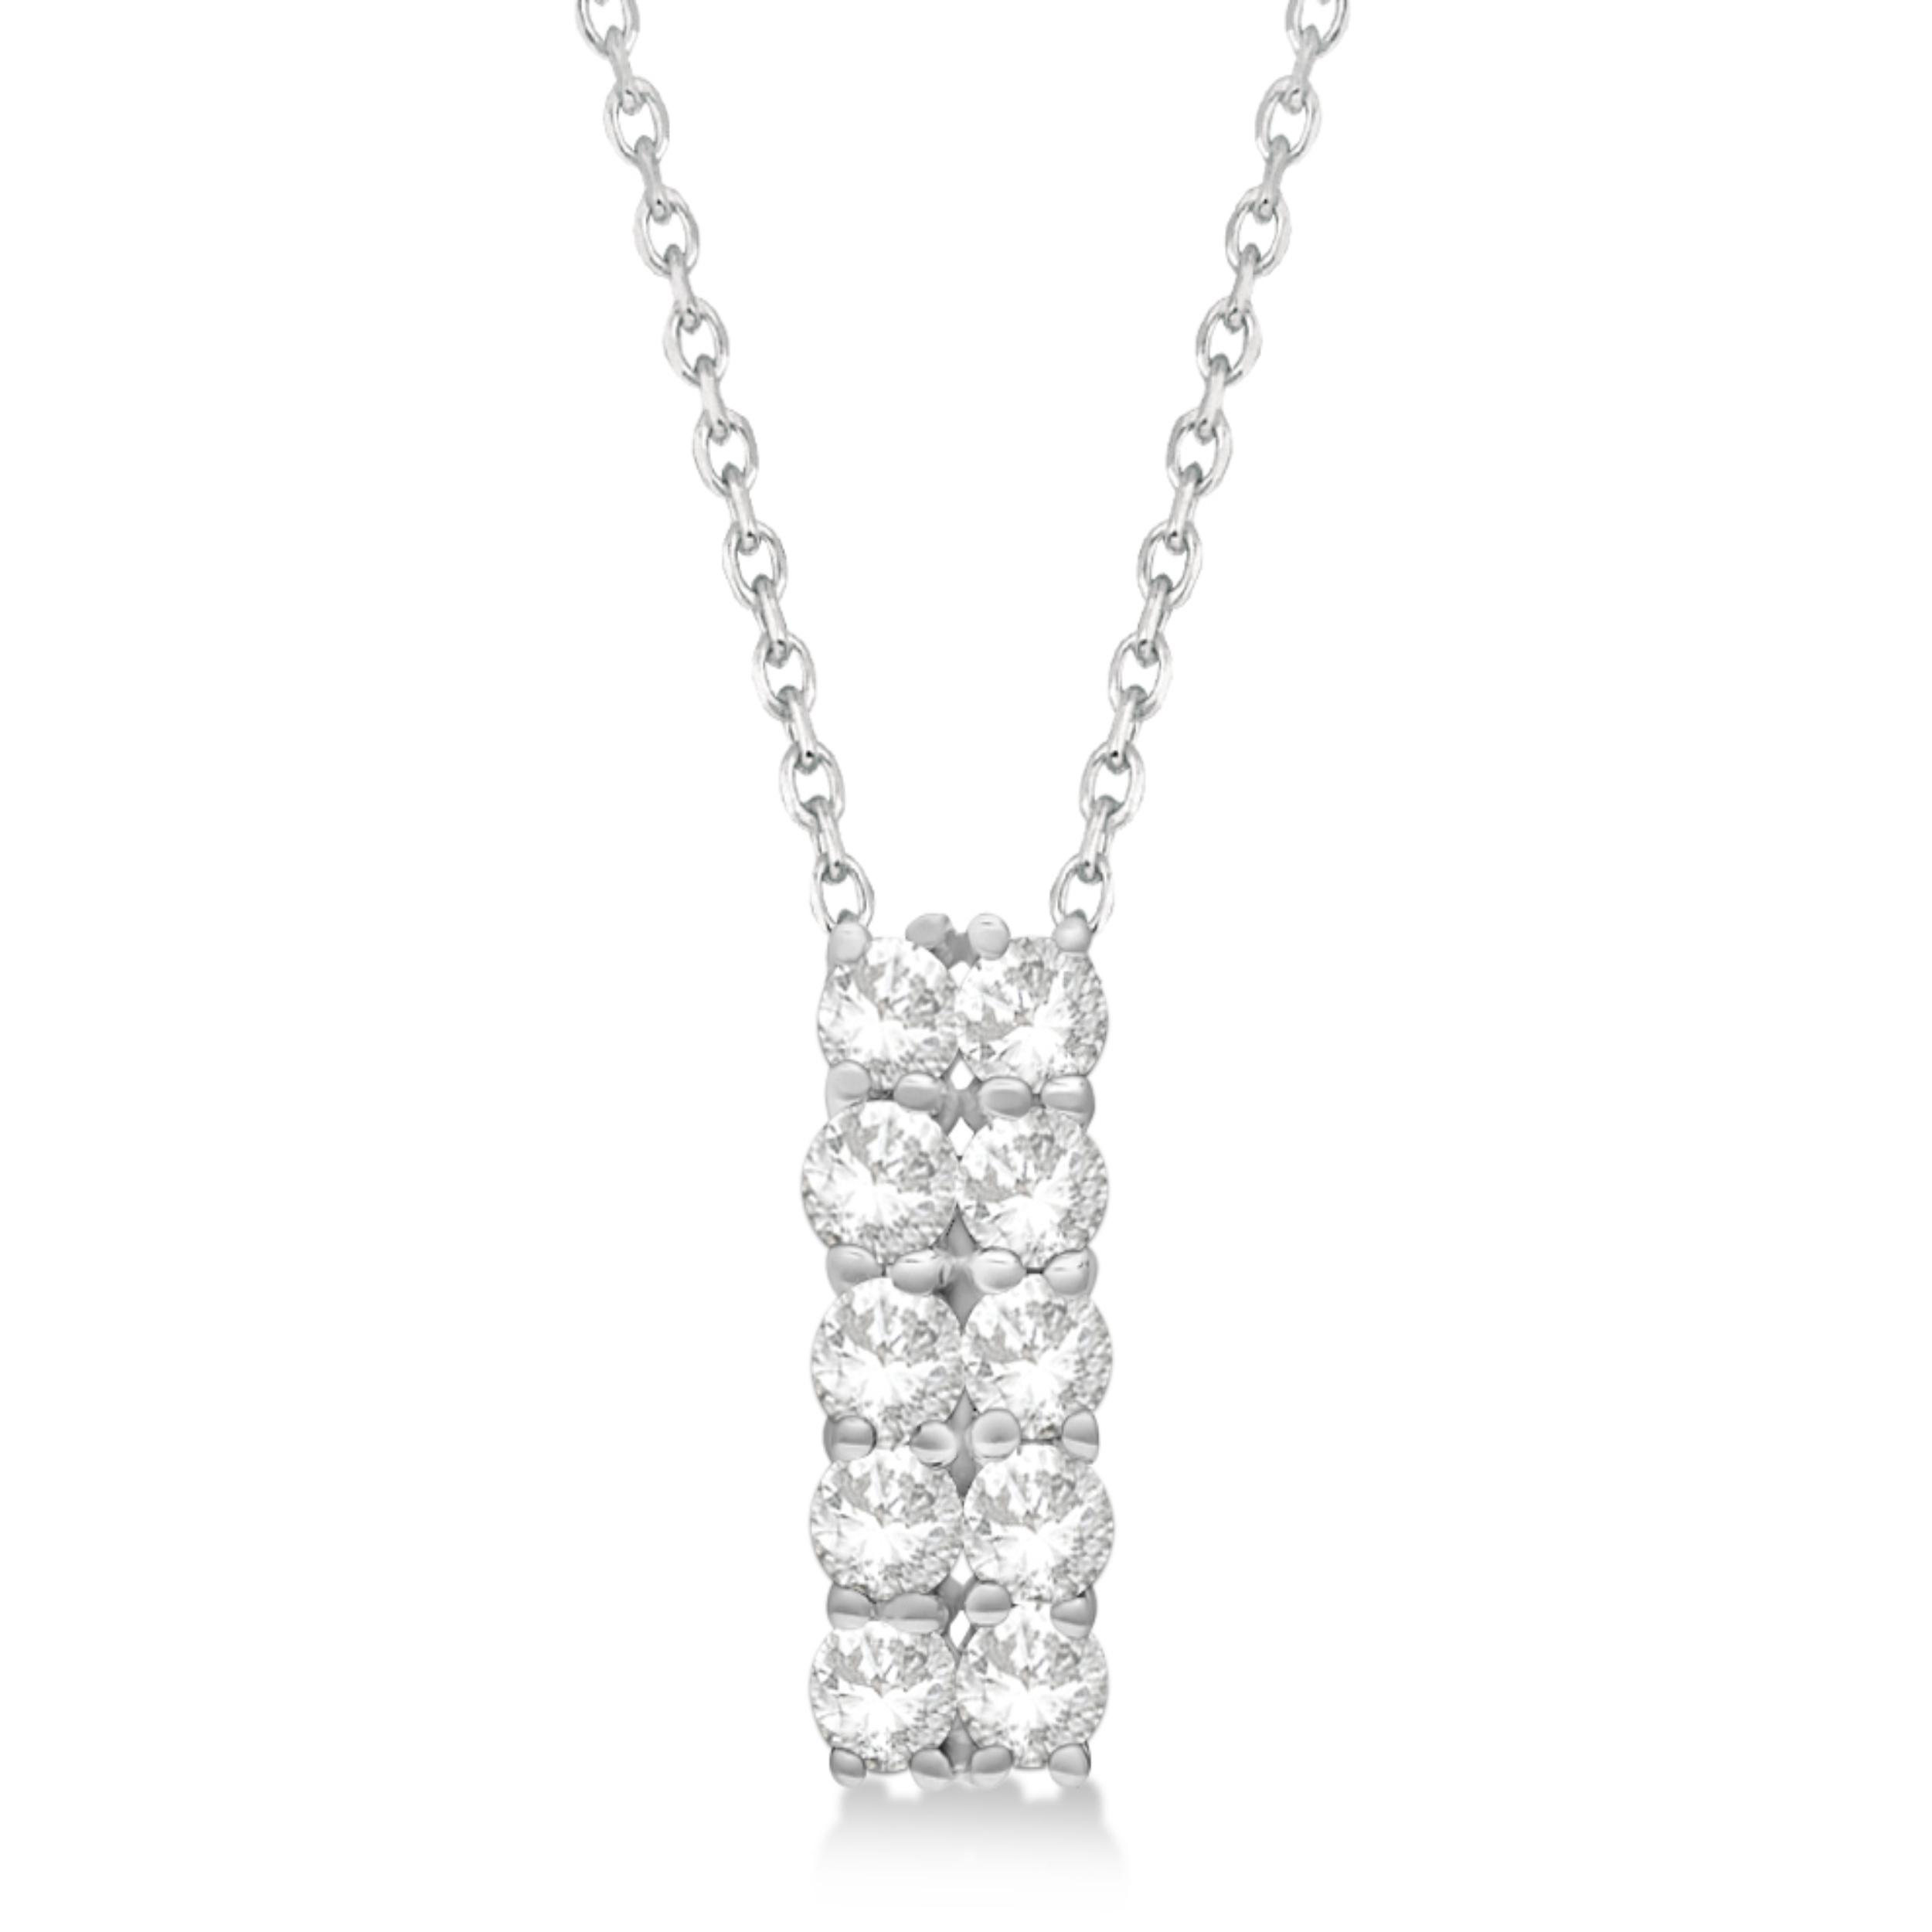 Double Row Diamond Drop Necklace 14k White Gold (1.01ct)